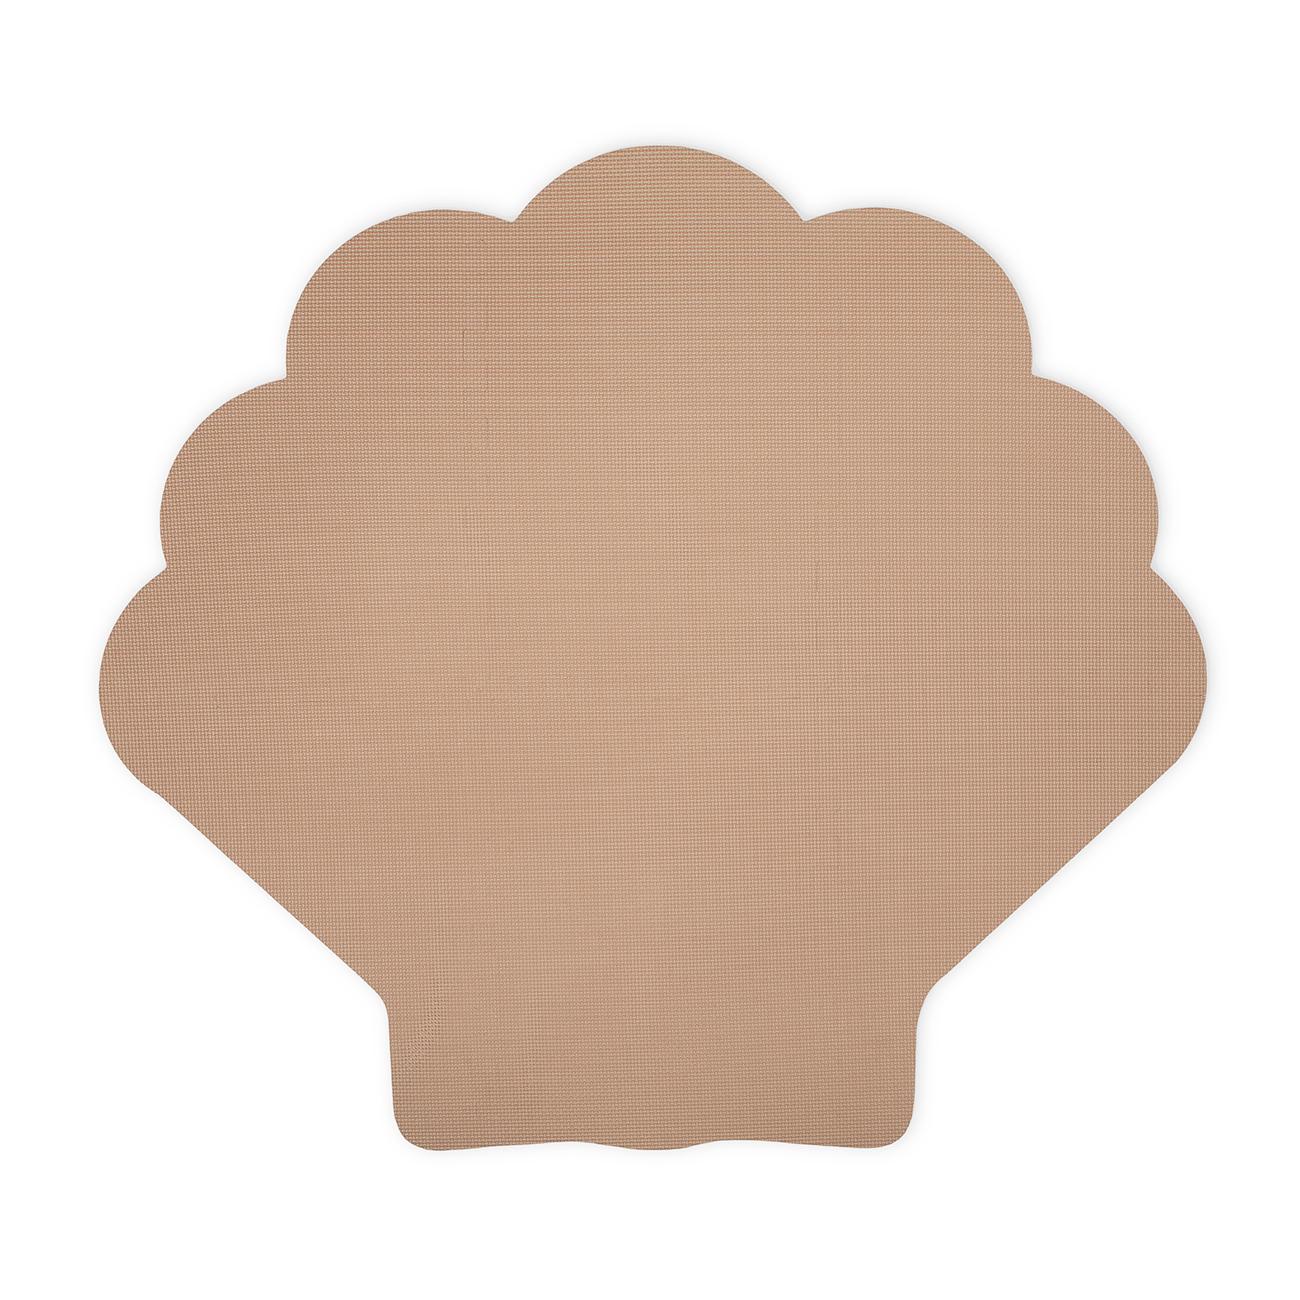 That's Mine - Foam Play Mat Shell - Light Brown (PM2110)